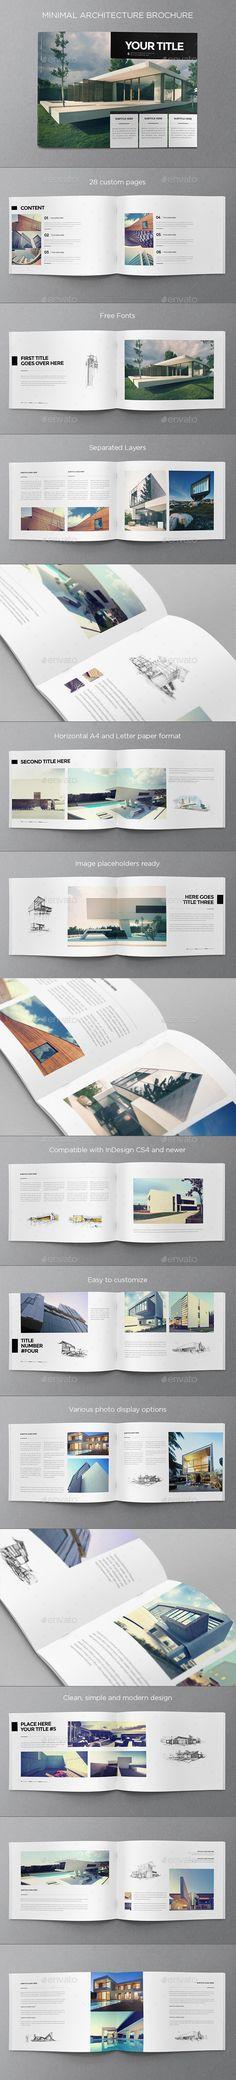 Minimal Architecture Brochure Template #design Download: http://graphicriver.net/item/minimal-architecture-brochure/9936143?ref=ksioks